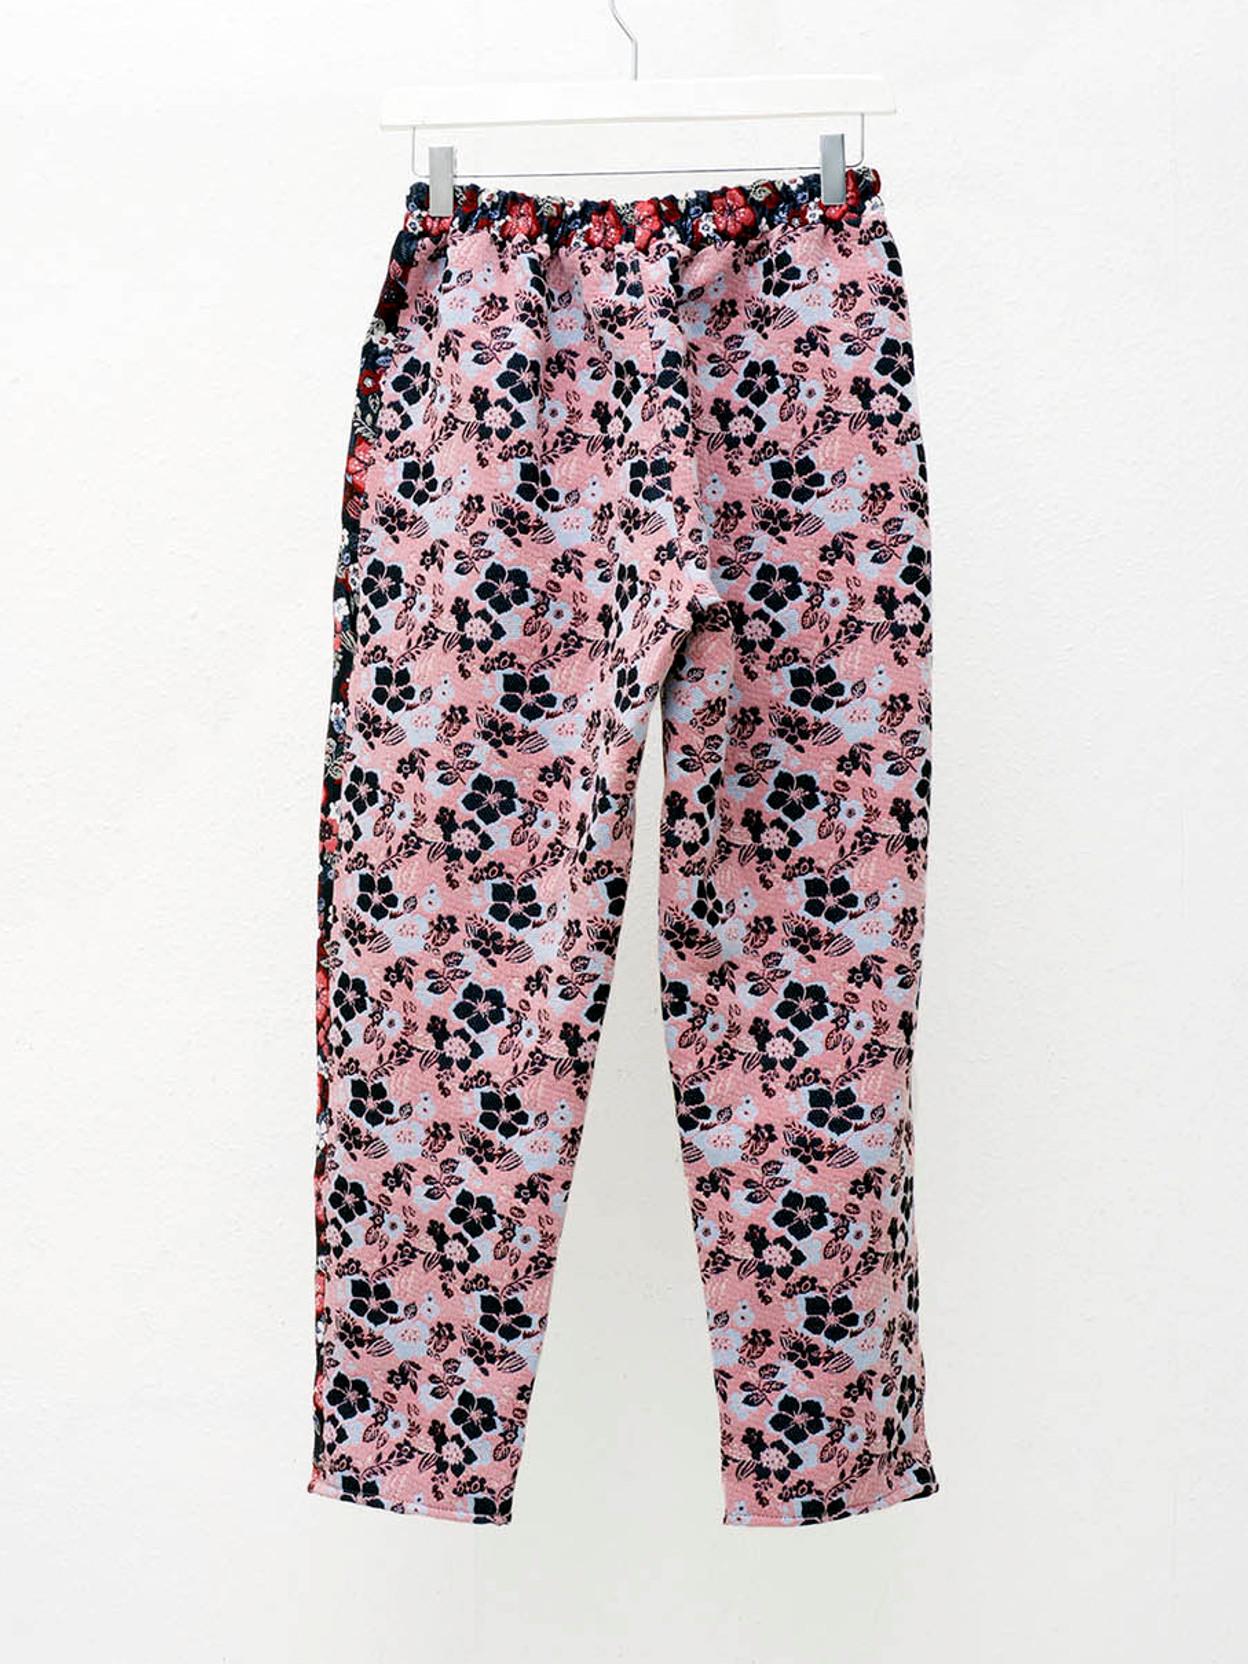 Tata Christiane Pink Flower Pants Wut